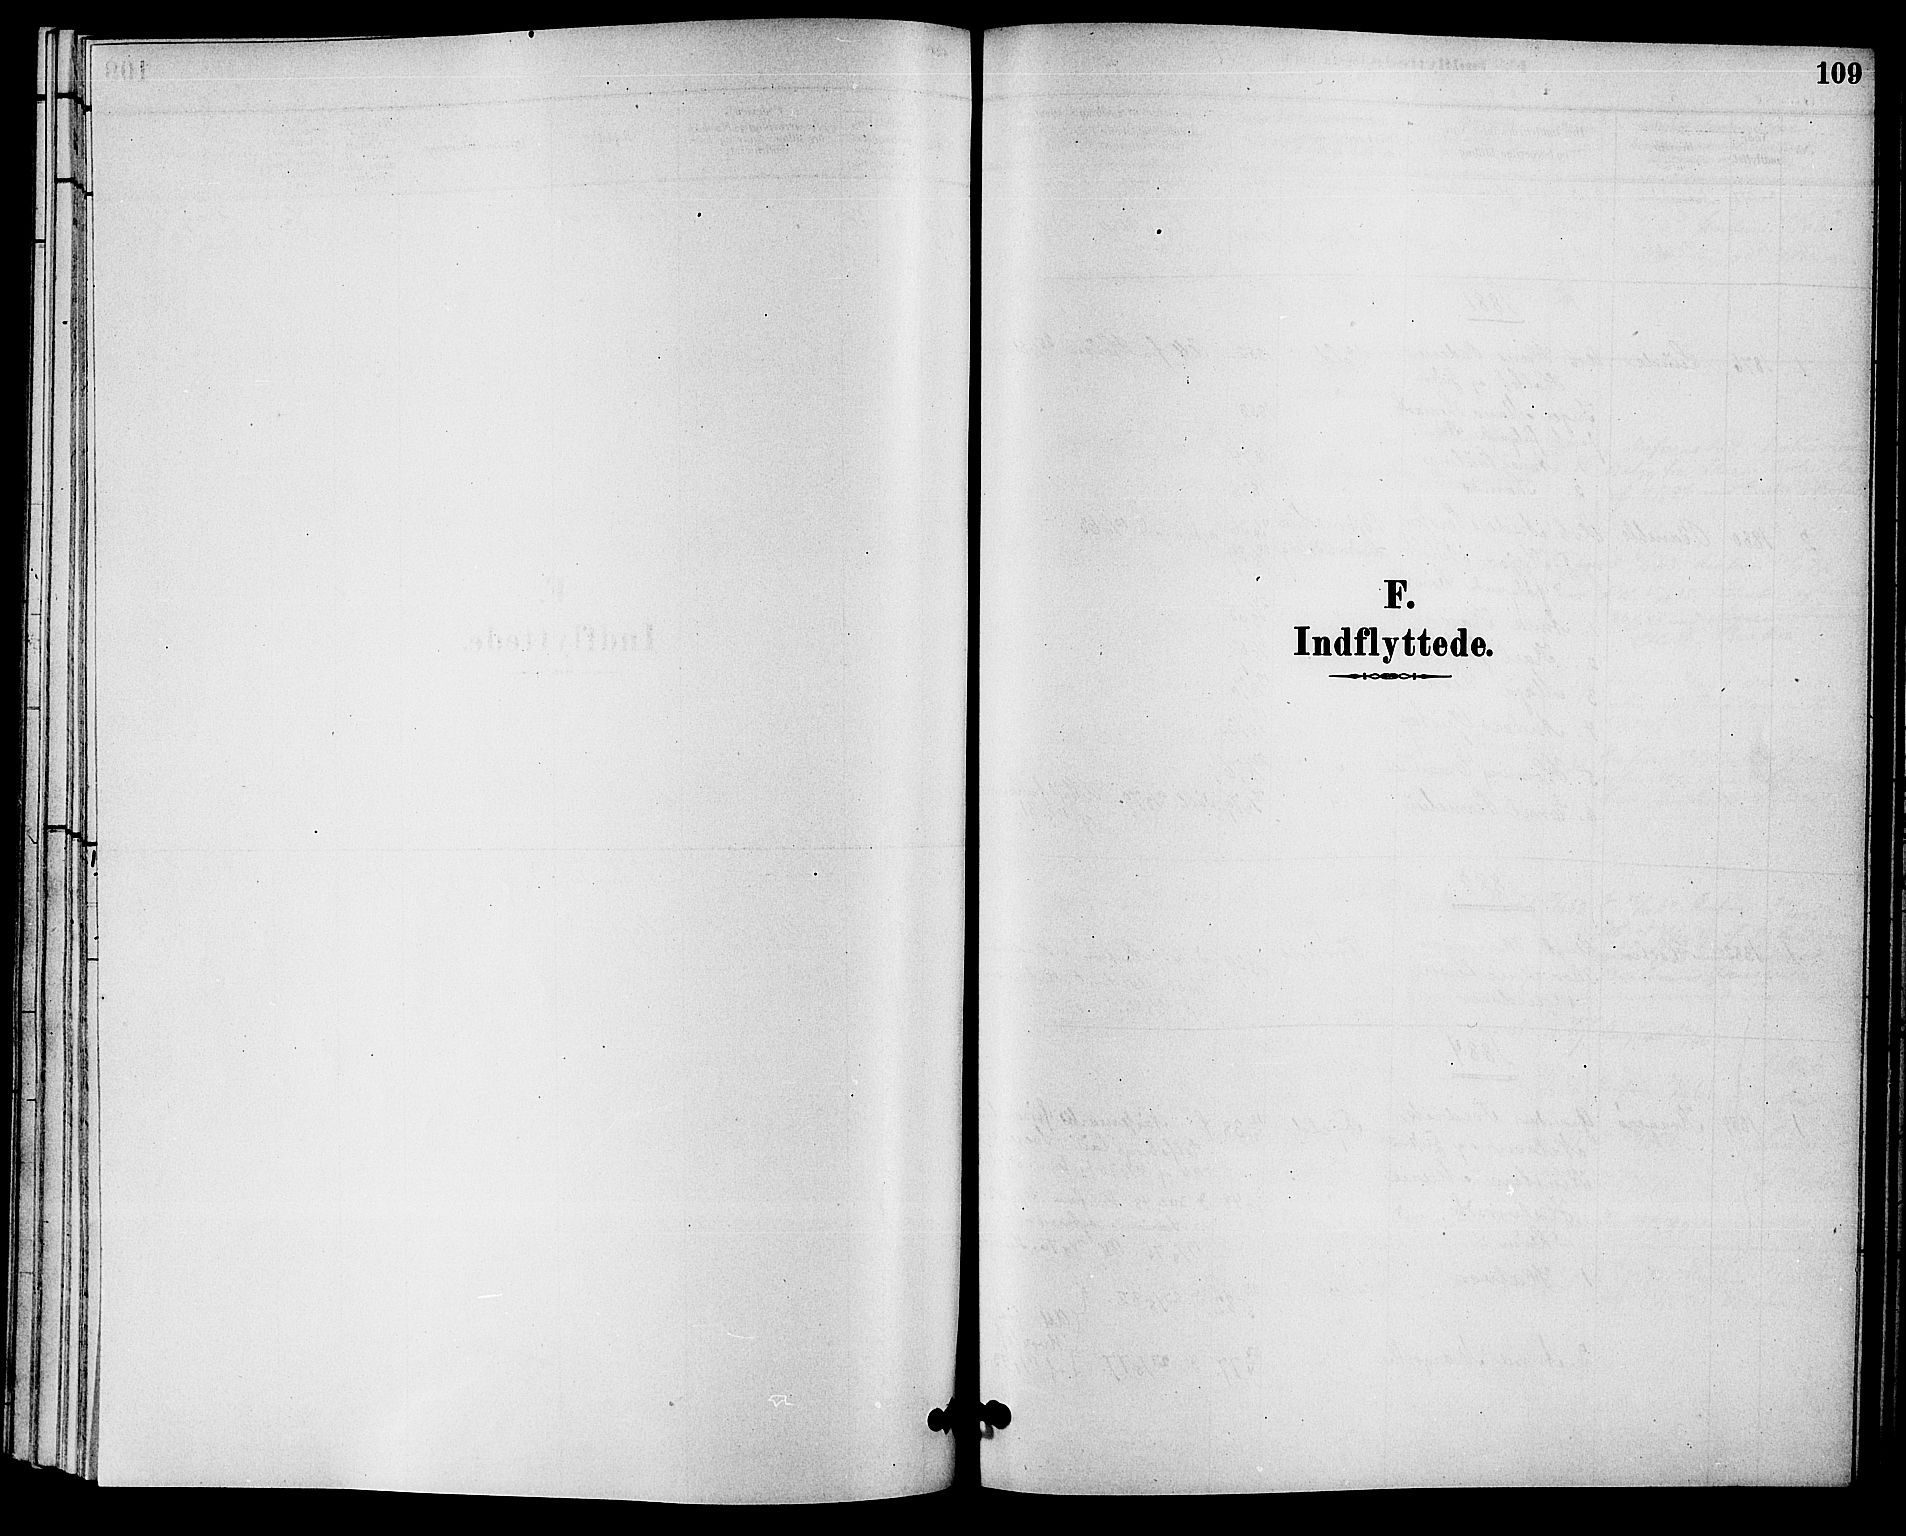 SAKO, Solum kirkebøker, F/Fc/L0001: Ministerialbok nr. III 1, 1877-1891, s. 109